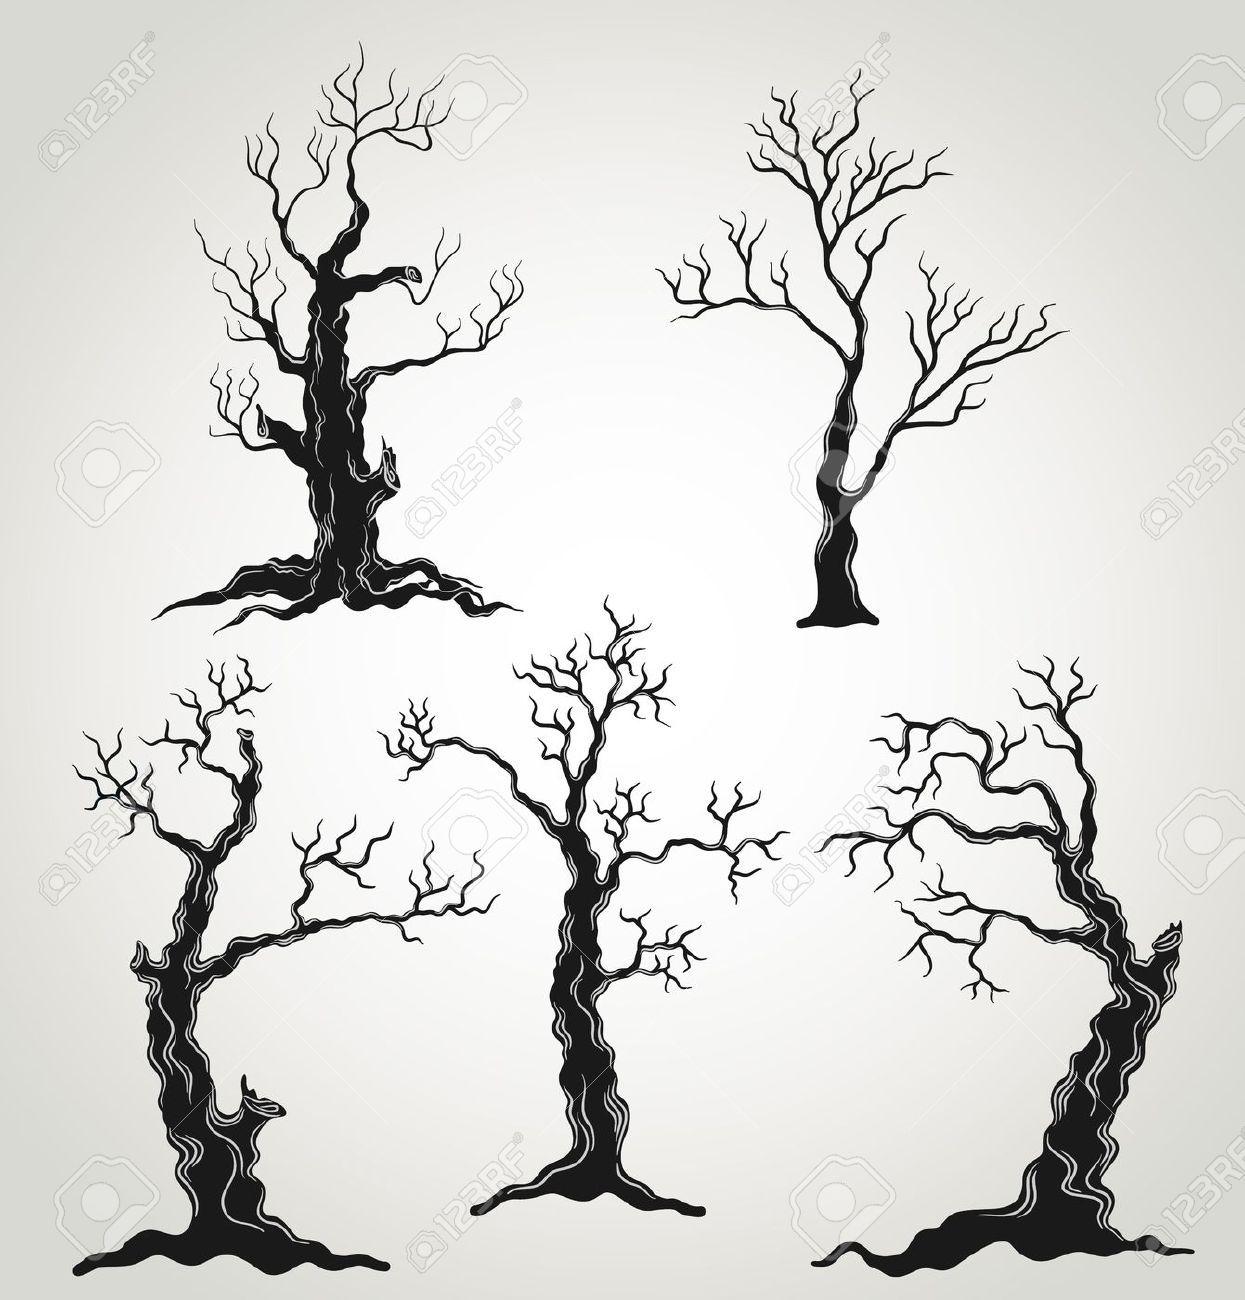 medium resolution of spooky tree stock vector illustration and royalty free spooky tree